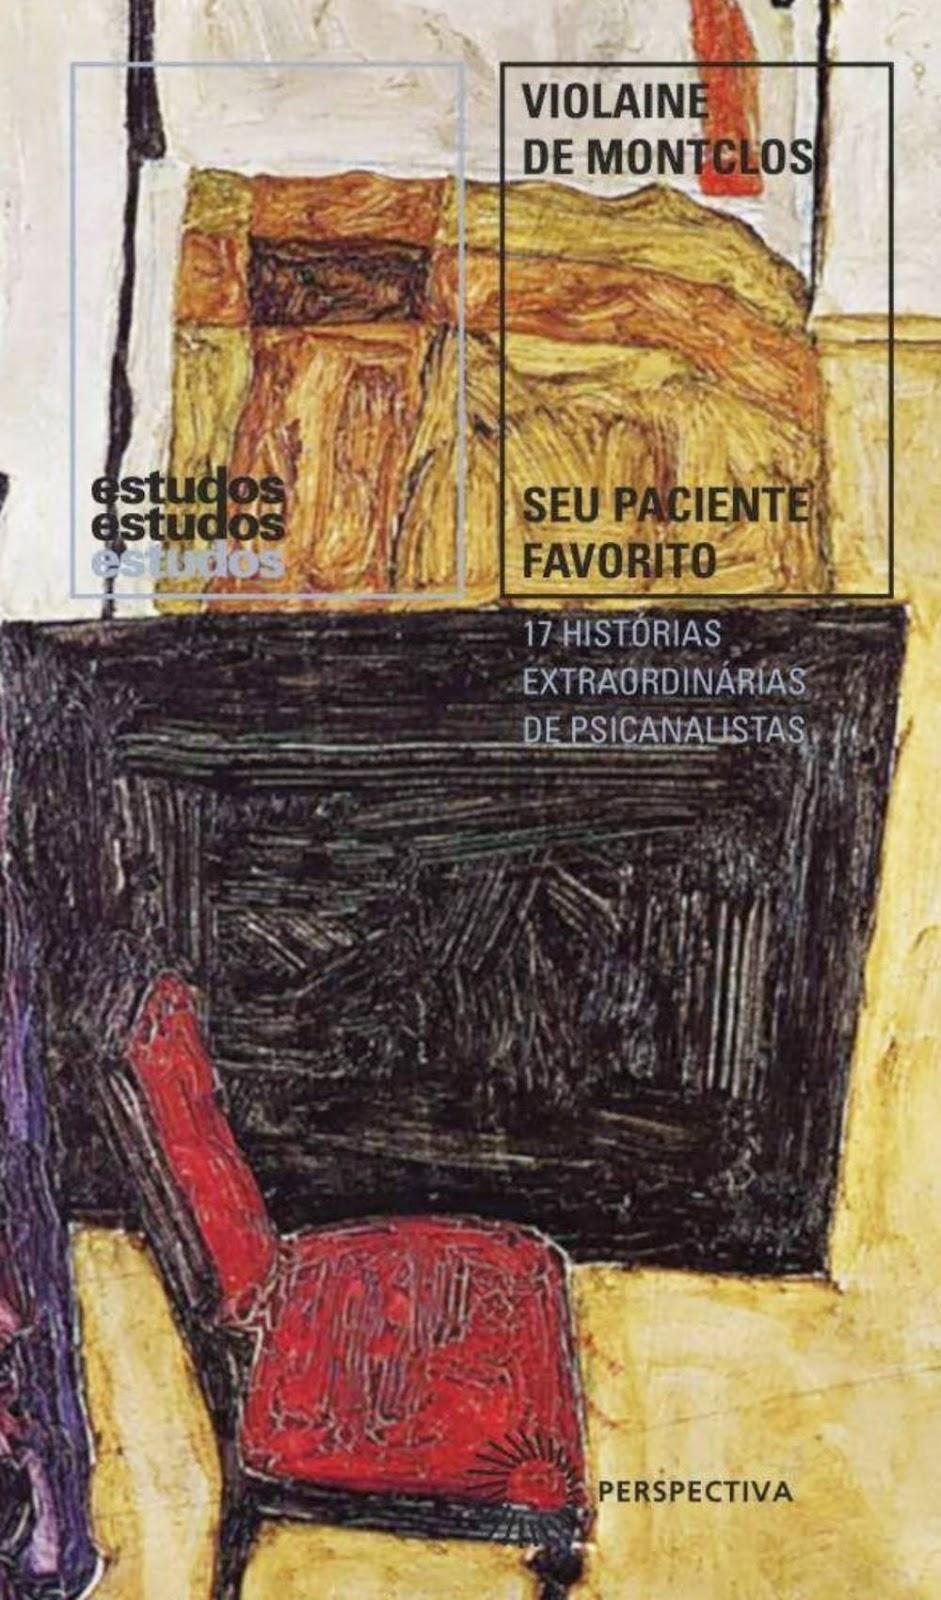 ambiente de leitura carlos romero francisco gil messias psicanálise relacao paciente psicanalista Violaine de Montclos psicanalistas e seus pacientes